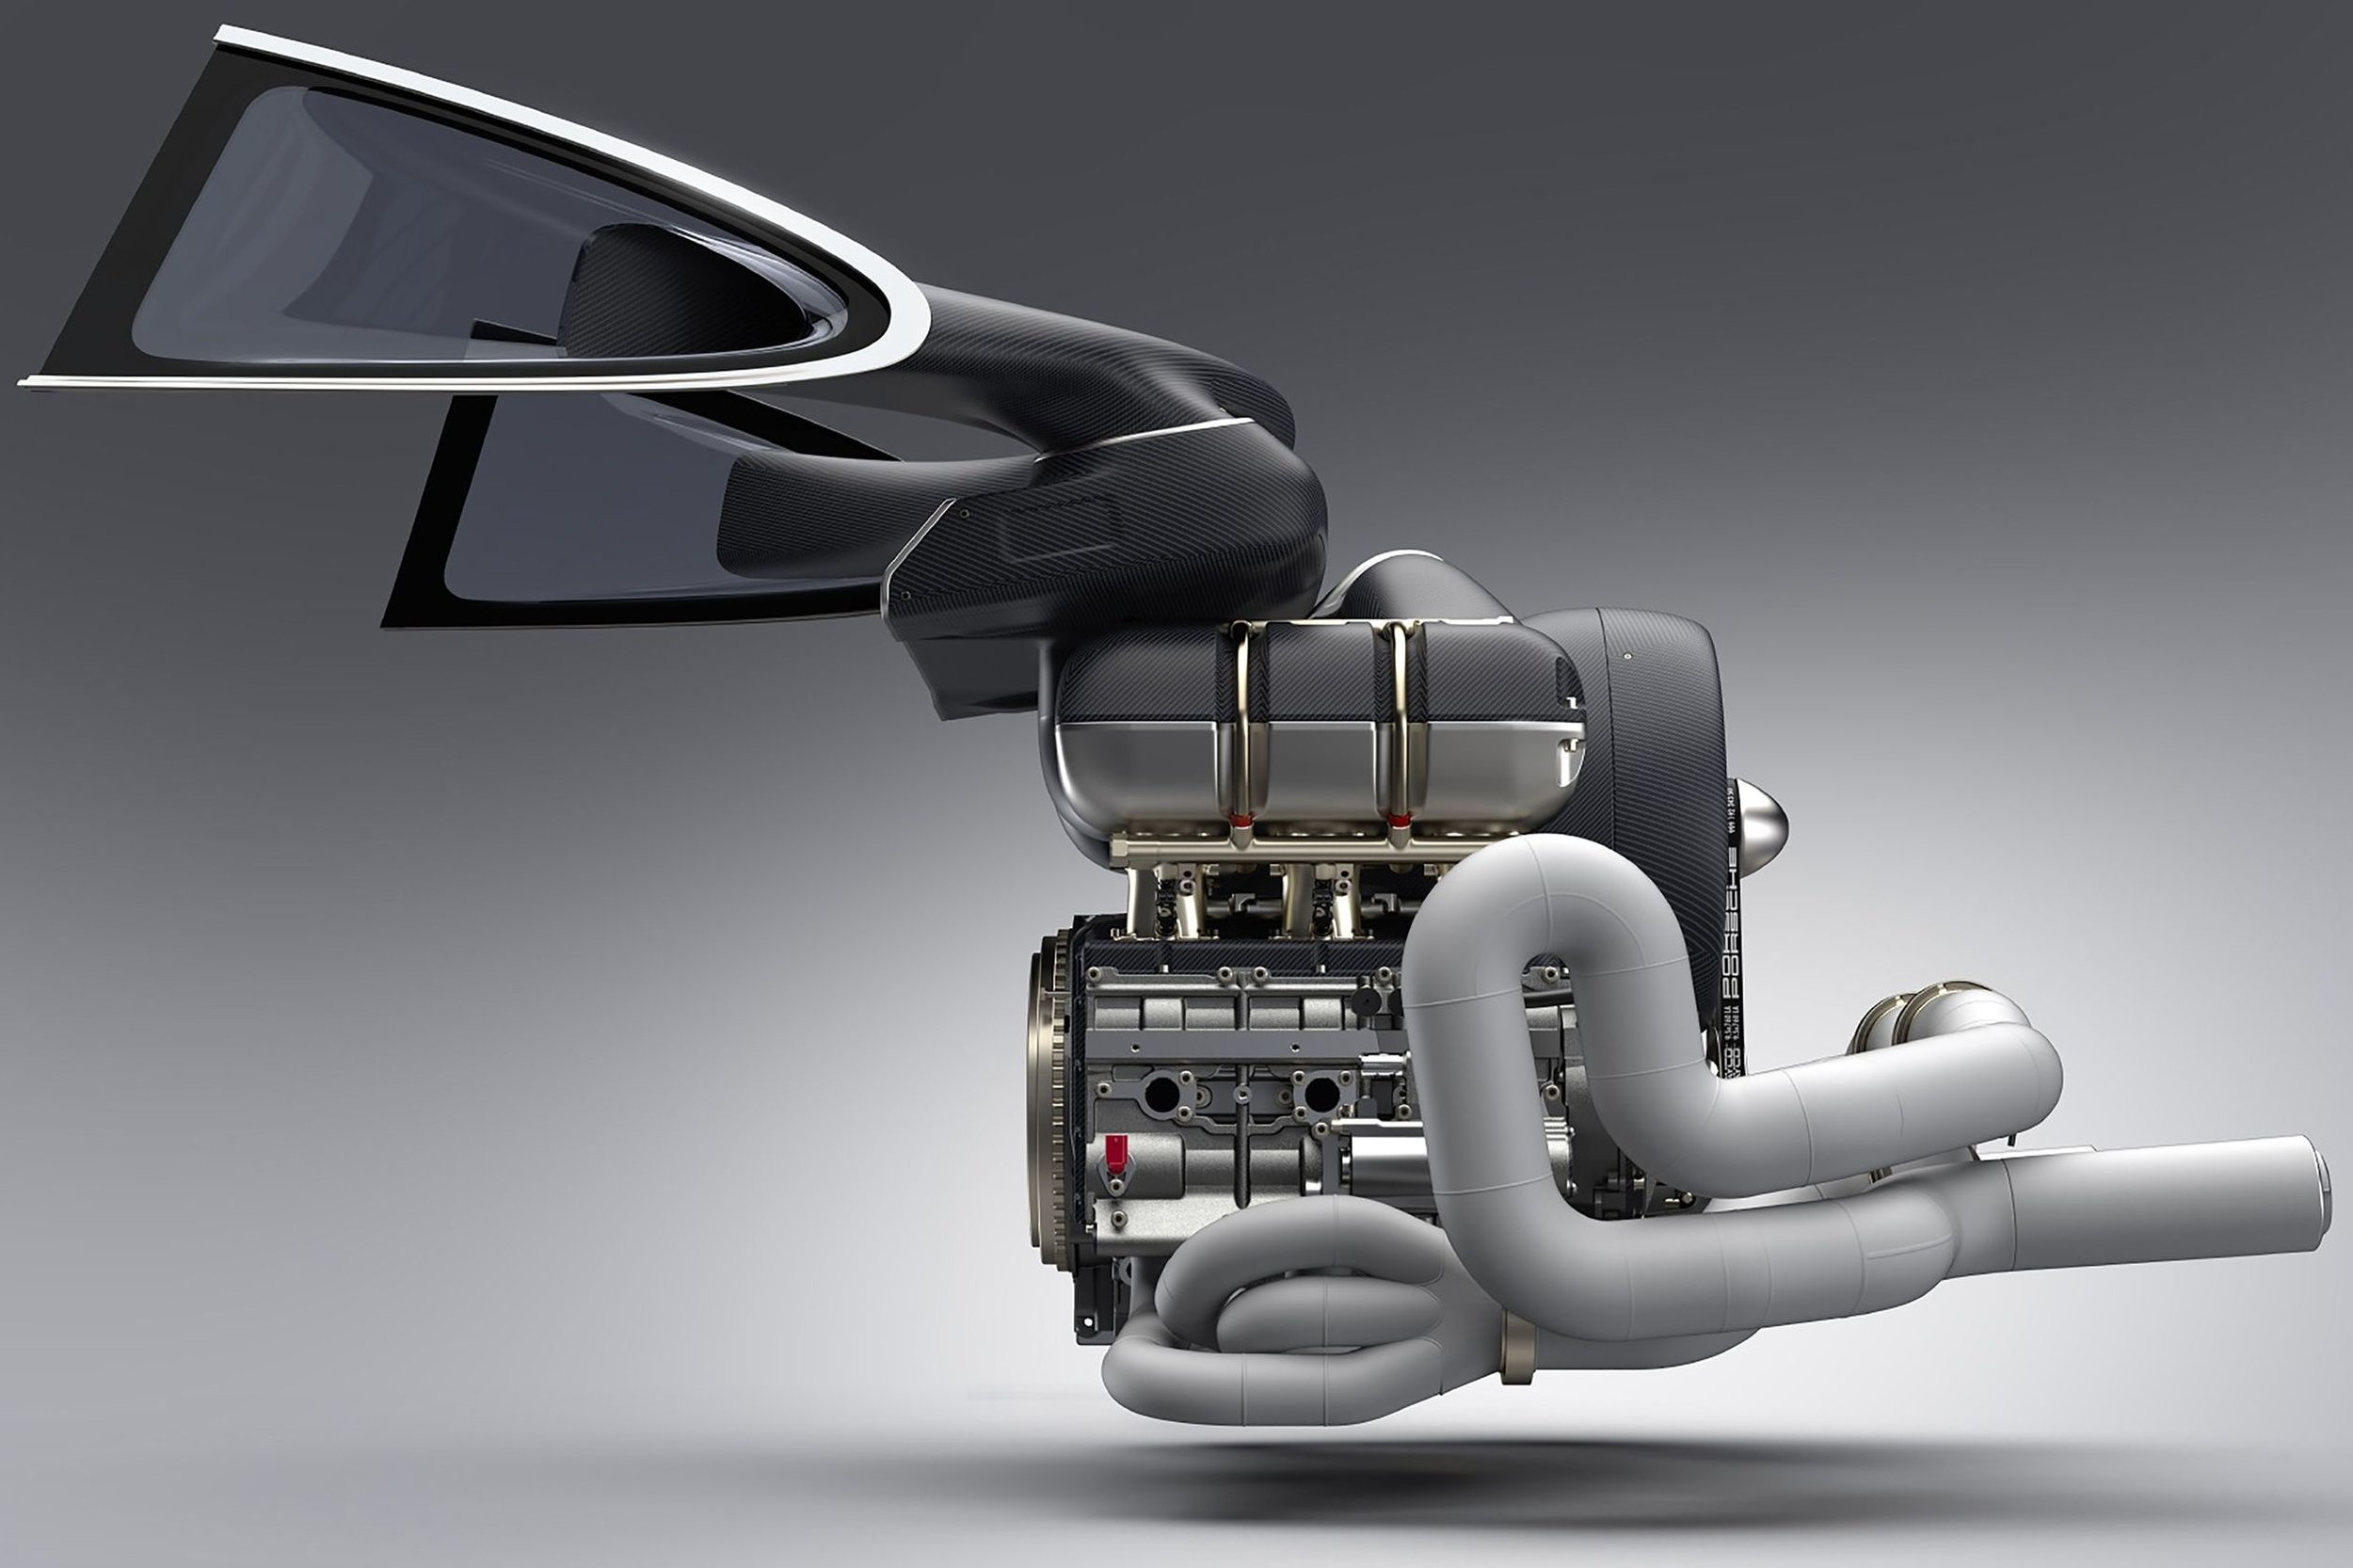 singer vehicle design - williams f1 - blacklist (7).jpg